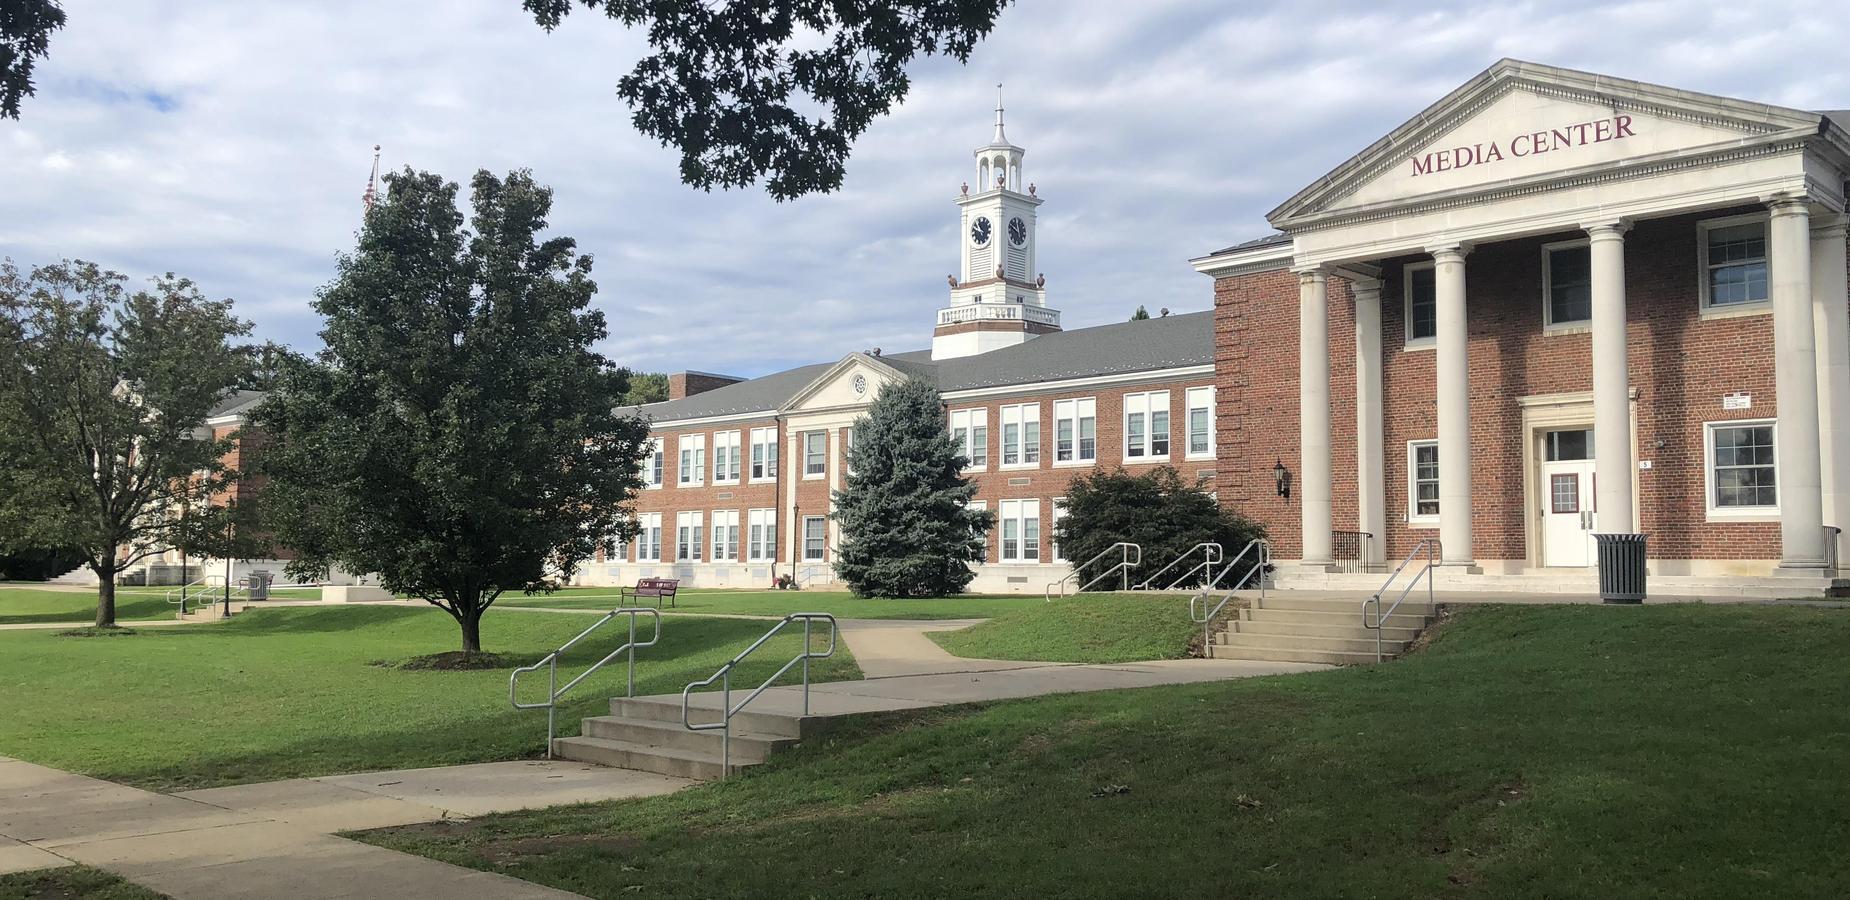 Phillipsburg Middle School